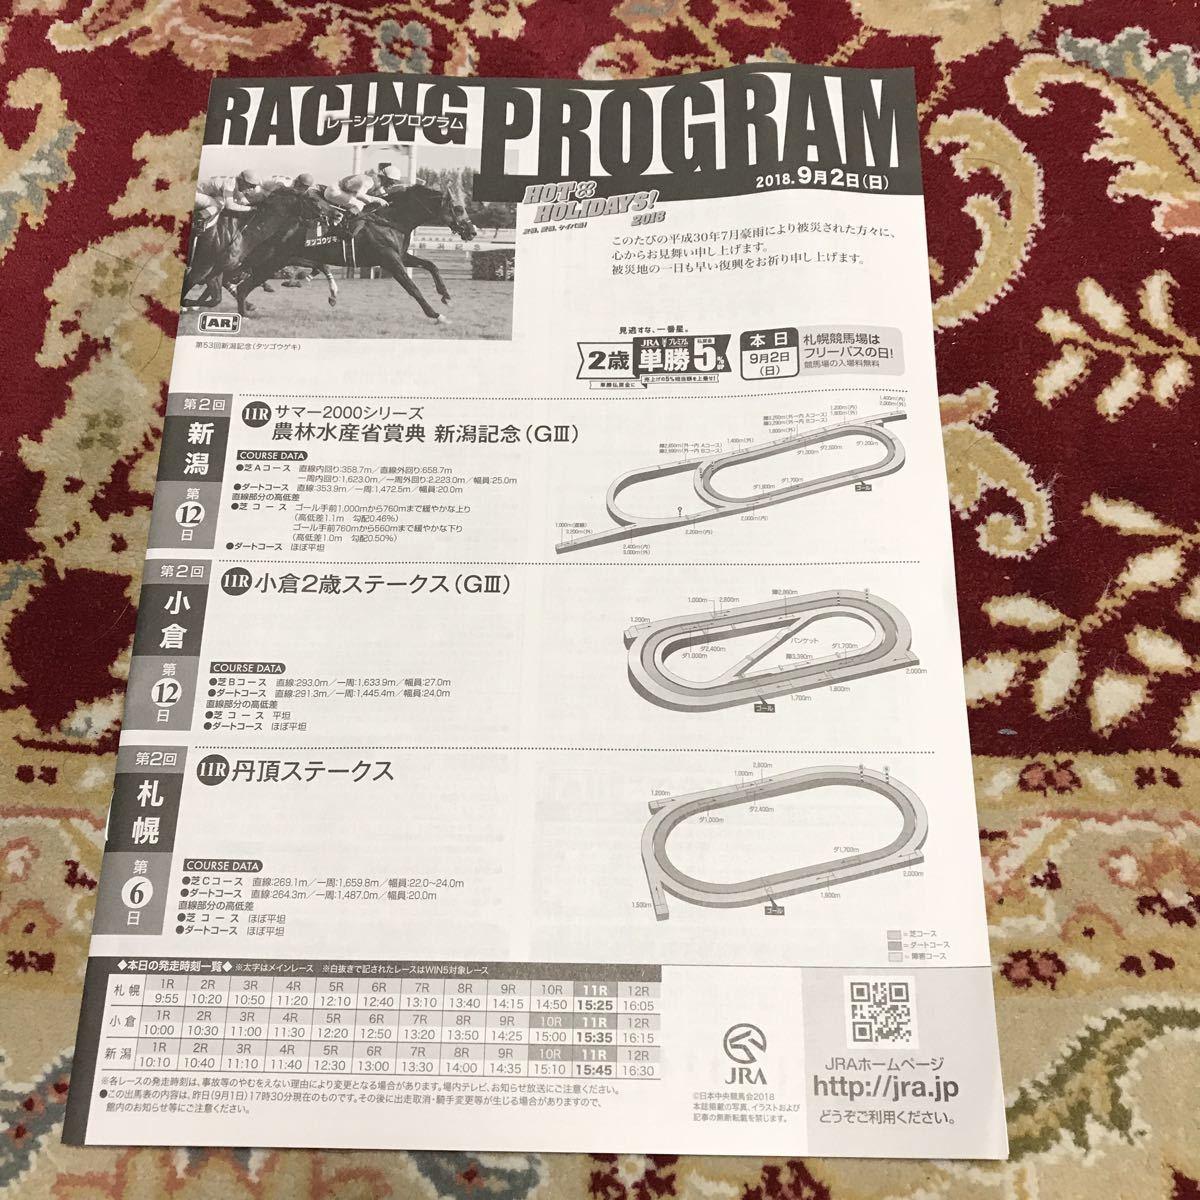 JRAレーシングプログラム2018.9月2日(日)新潟記念(GⅢ)、小倉2歳ステークス(GⅢ)、丹頂ステークス_画像1